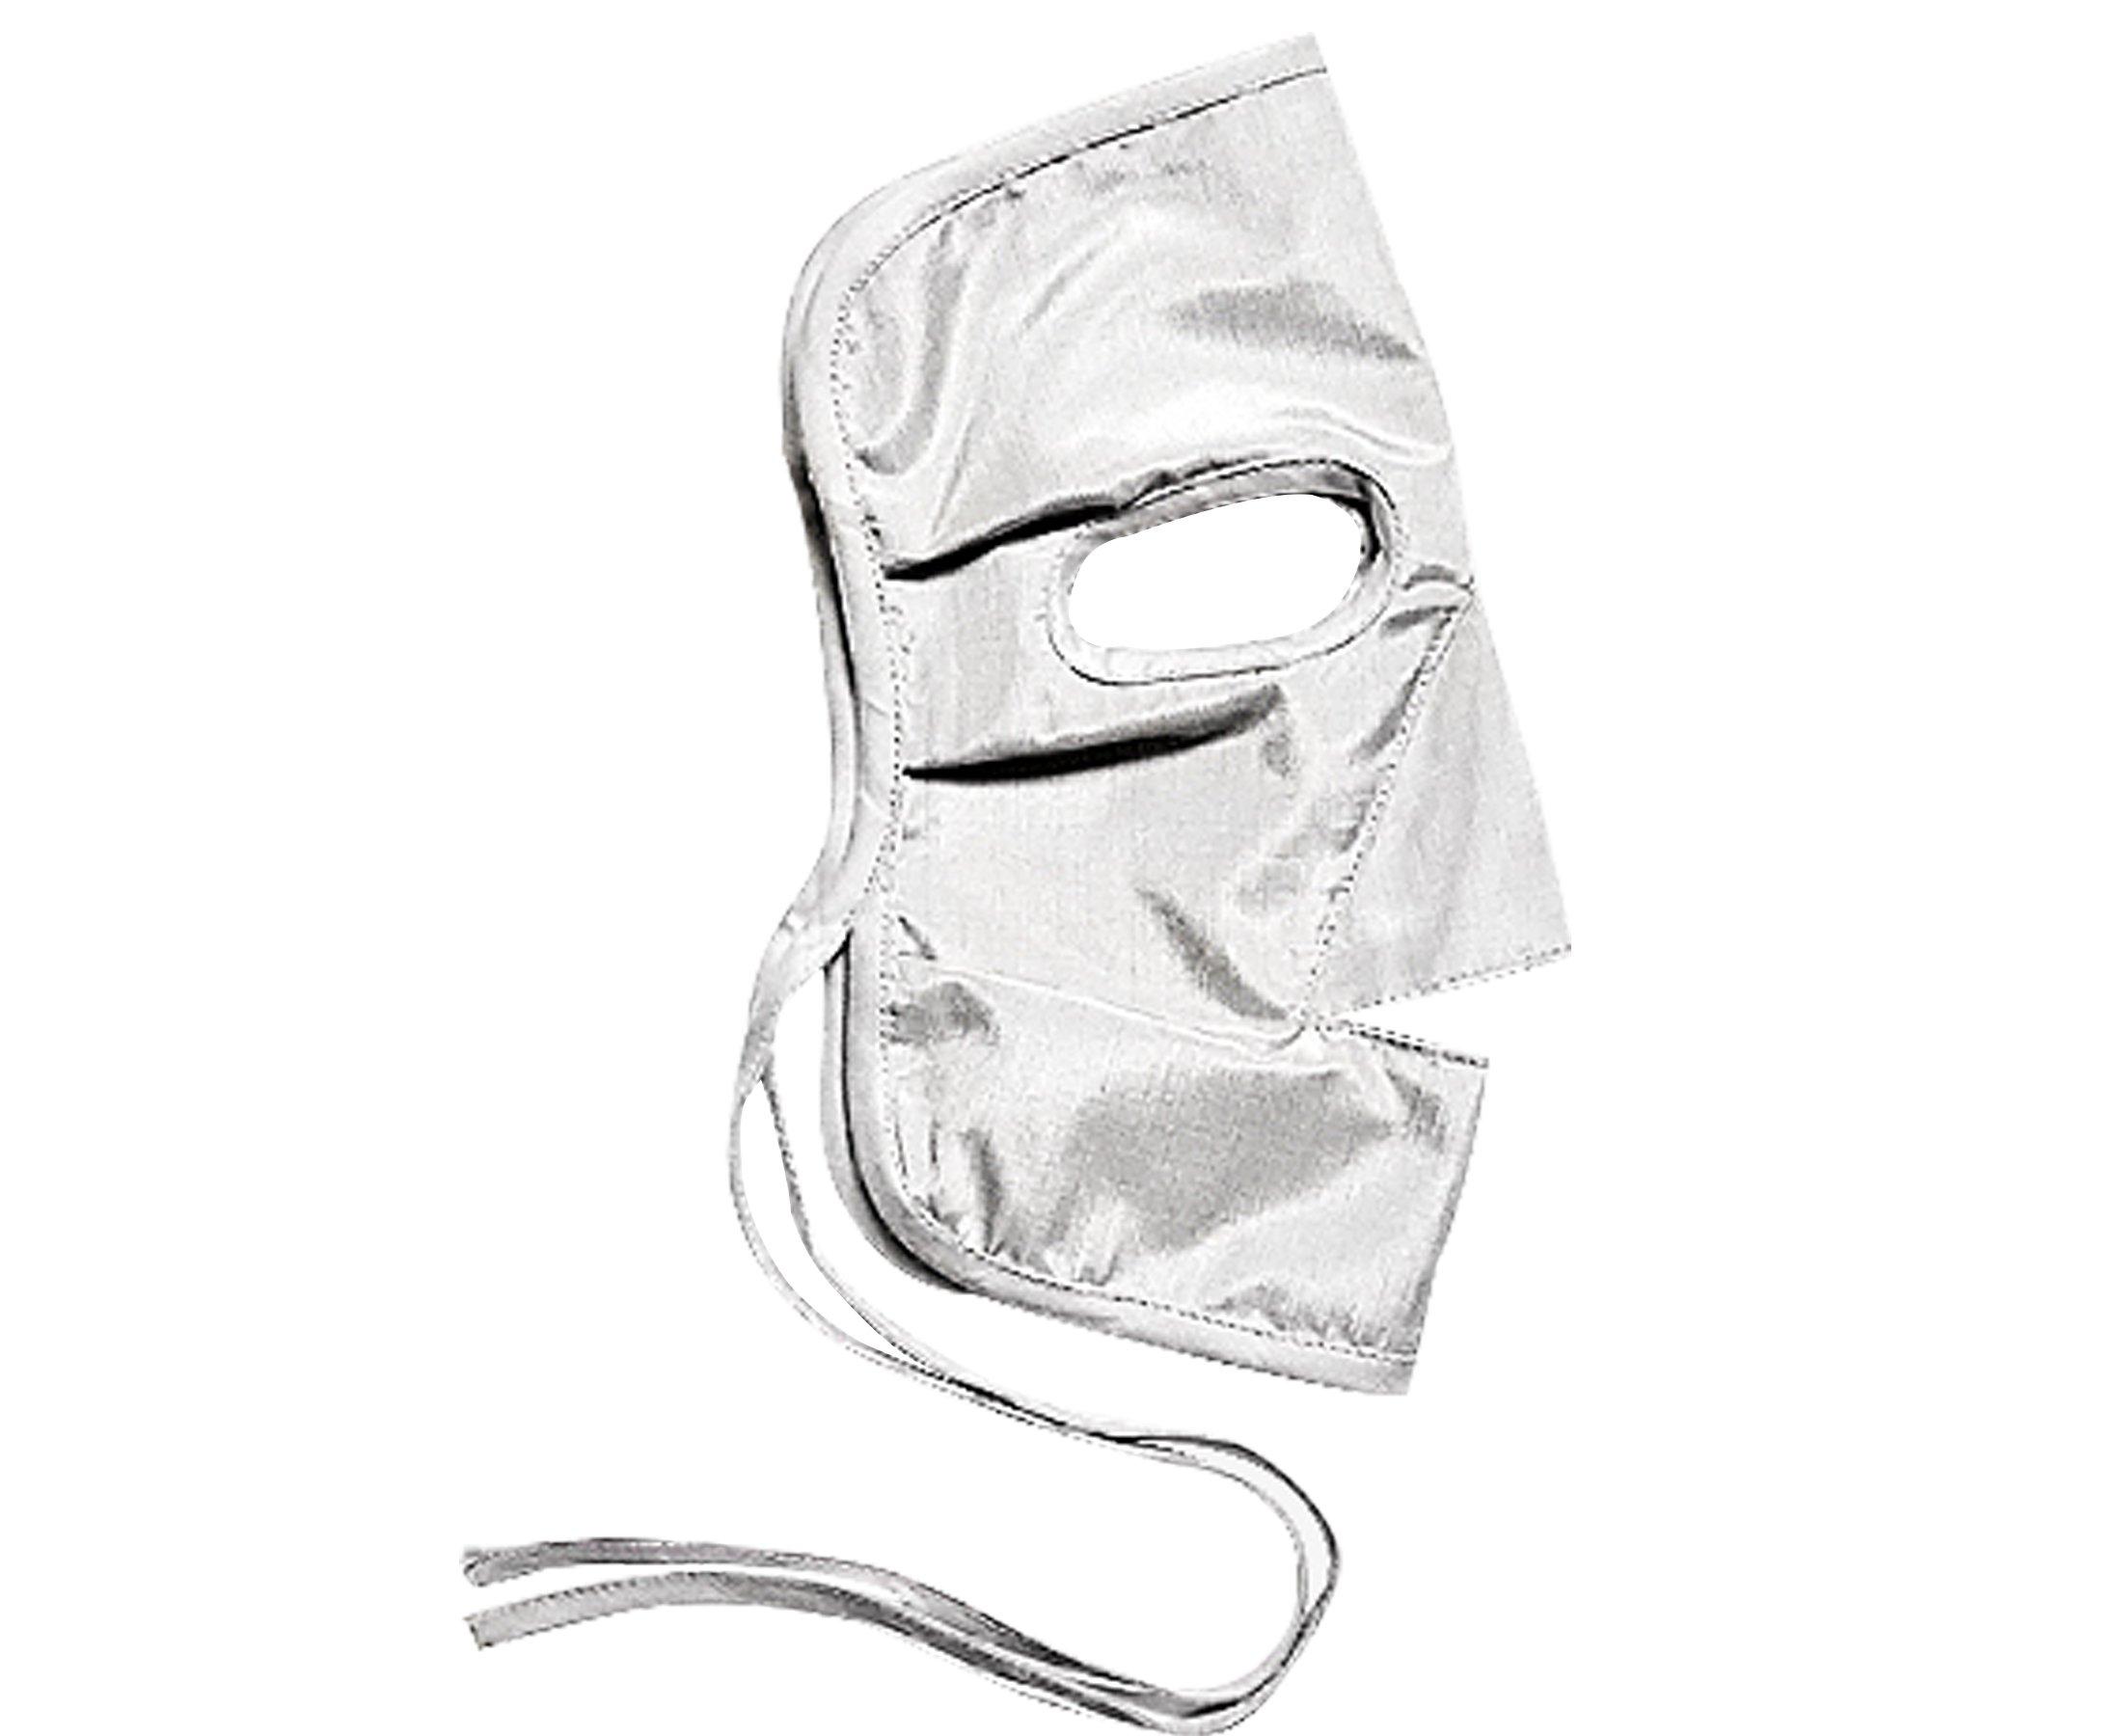 LVFEIER Anti-radiation mask breathable skin care Internet protection computer radiation masks men and women silver fiber sunscreen Masks by LVFEIER (Image #1)